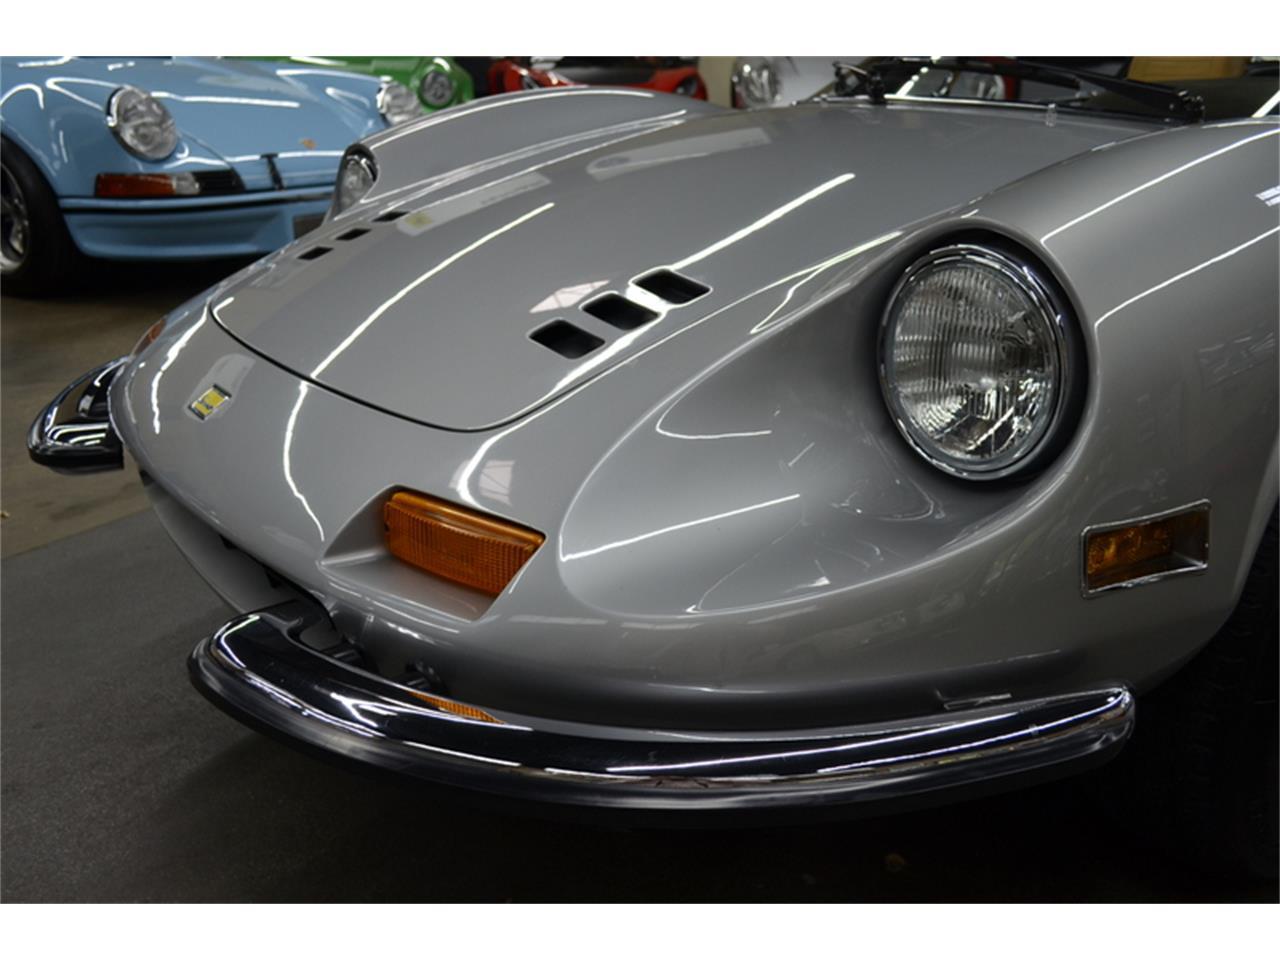 Large Picture of '73 Ferrari Dino located in New York - Q4FZ